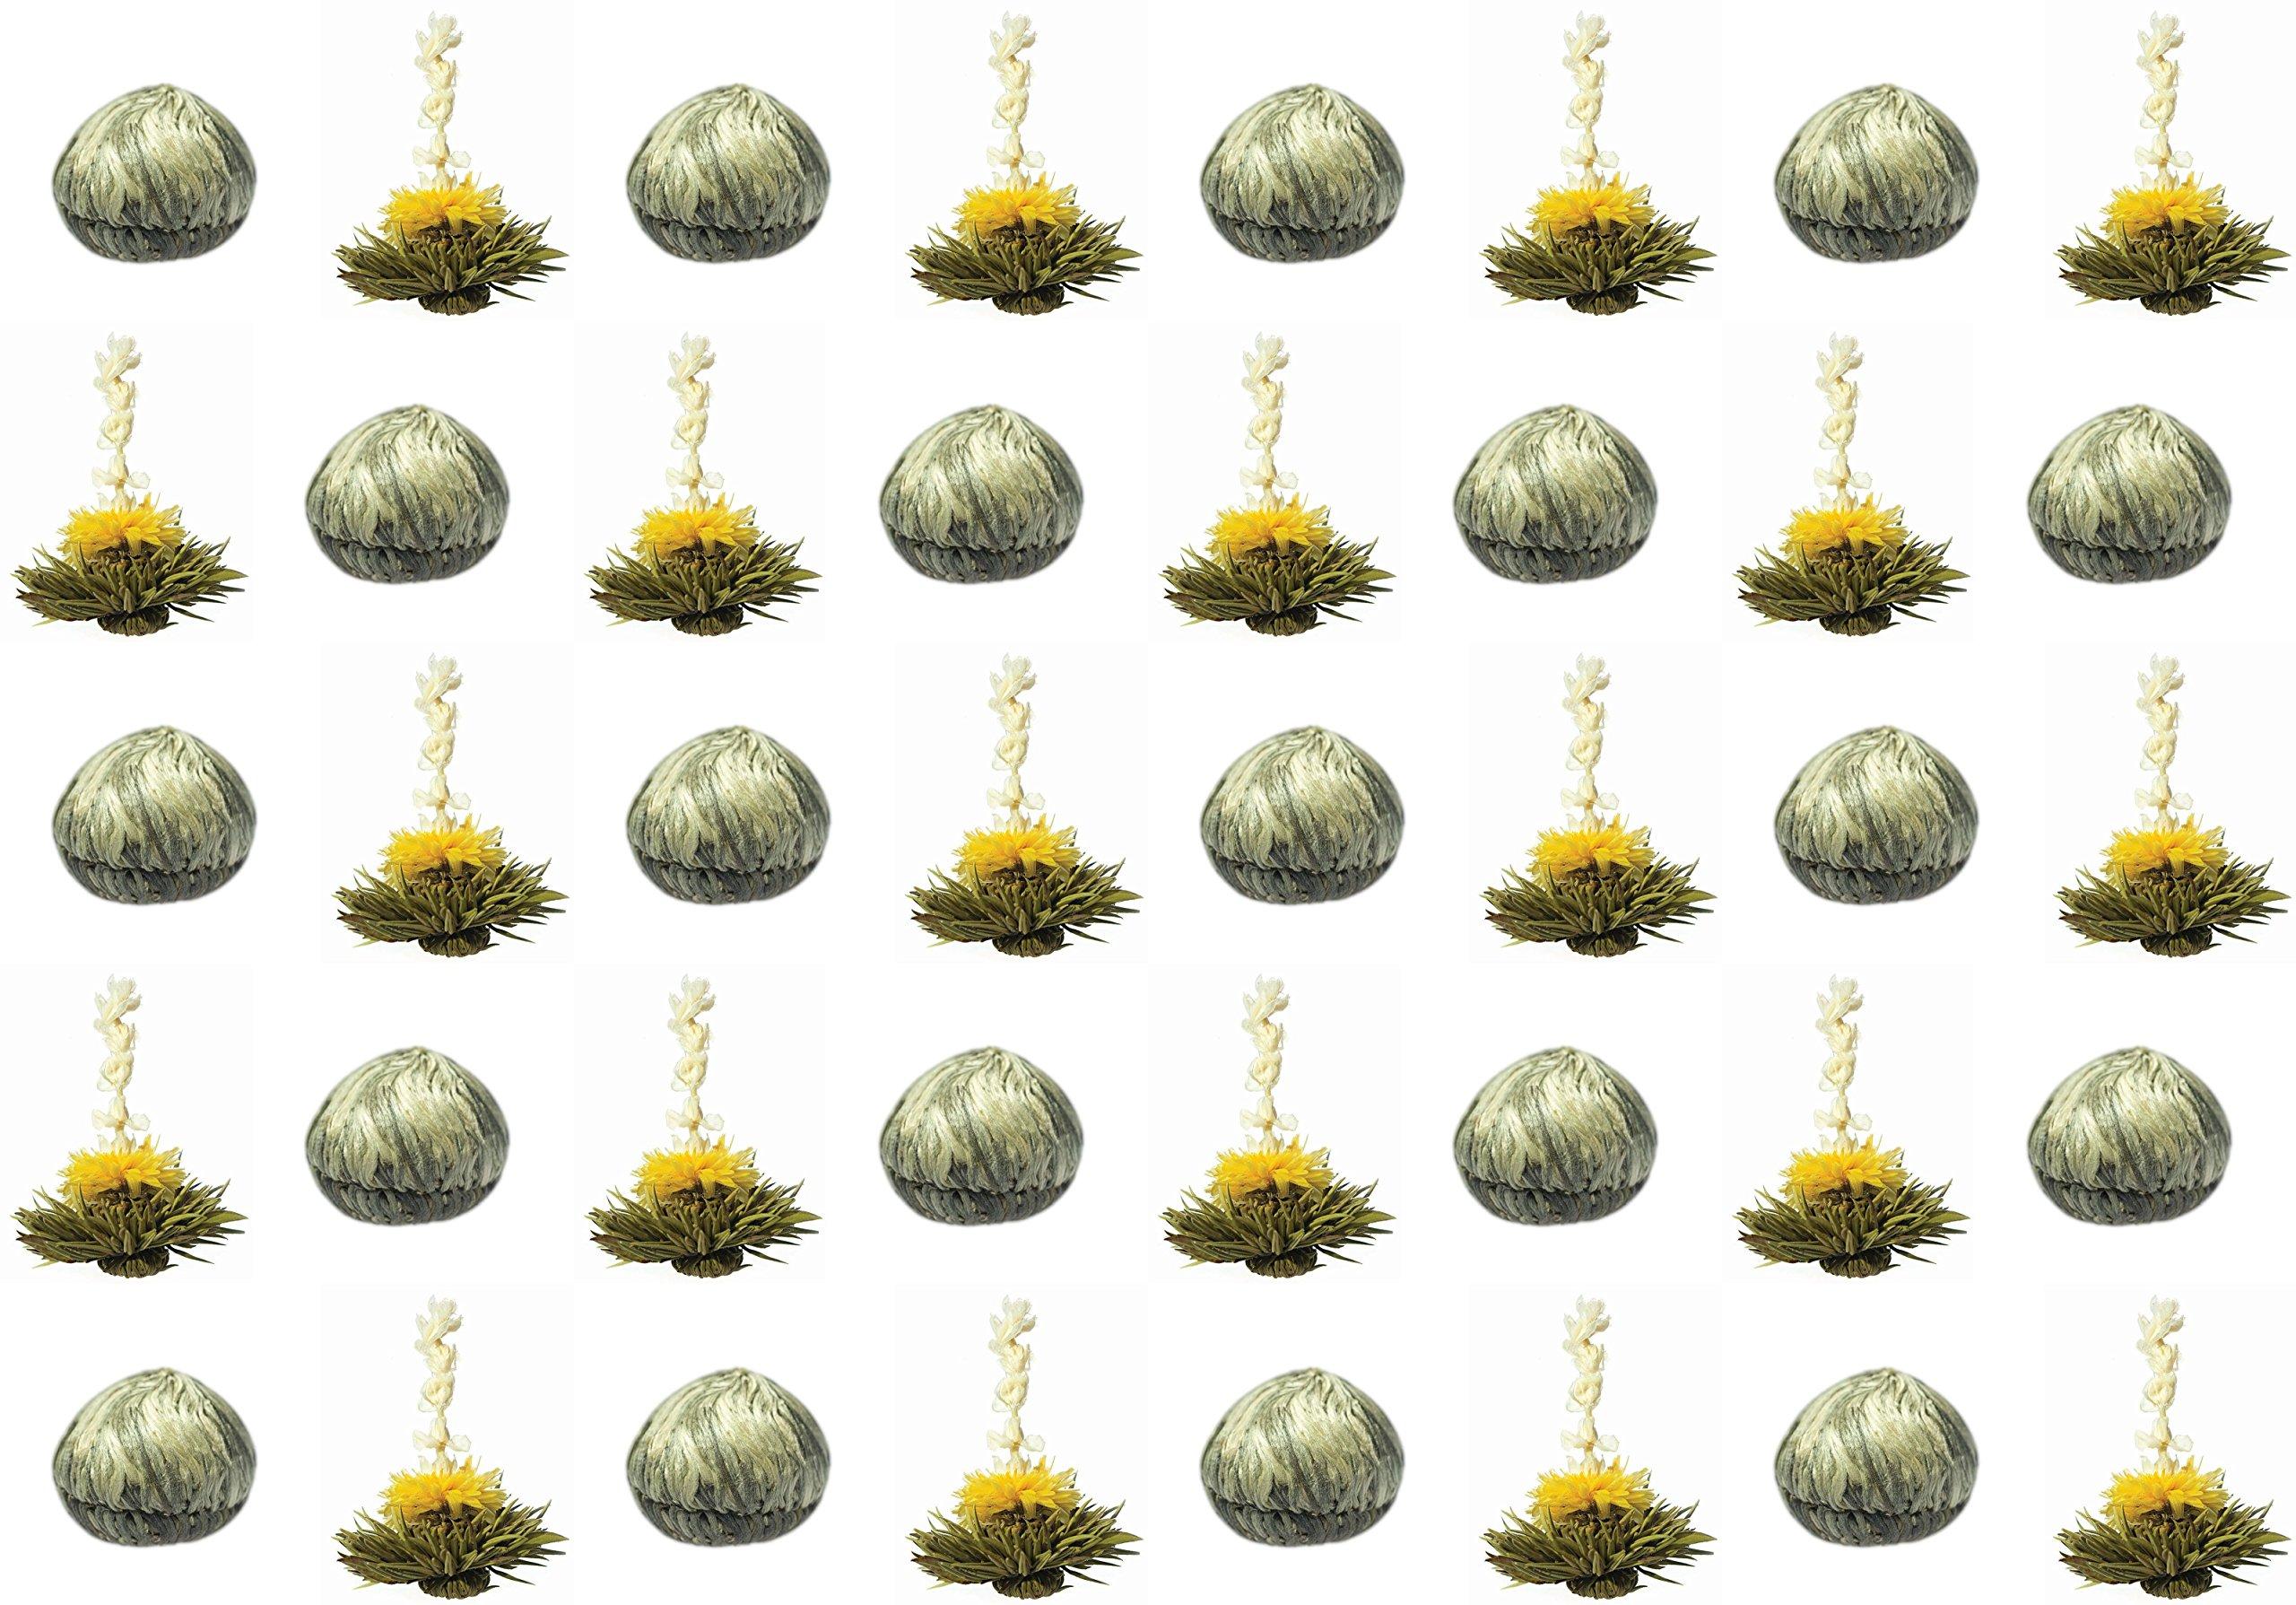 40-Stck-Restposten-Sonderangebot-weier-BIO-Tee-Teeblumen-1-Sorte-Teerosen-Teeblten-blooming-tea-Erblhtee-Aufblhtee-aus-hochwertigem-BIO-Weitee-by-Feelino